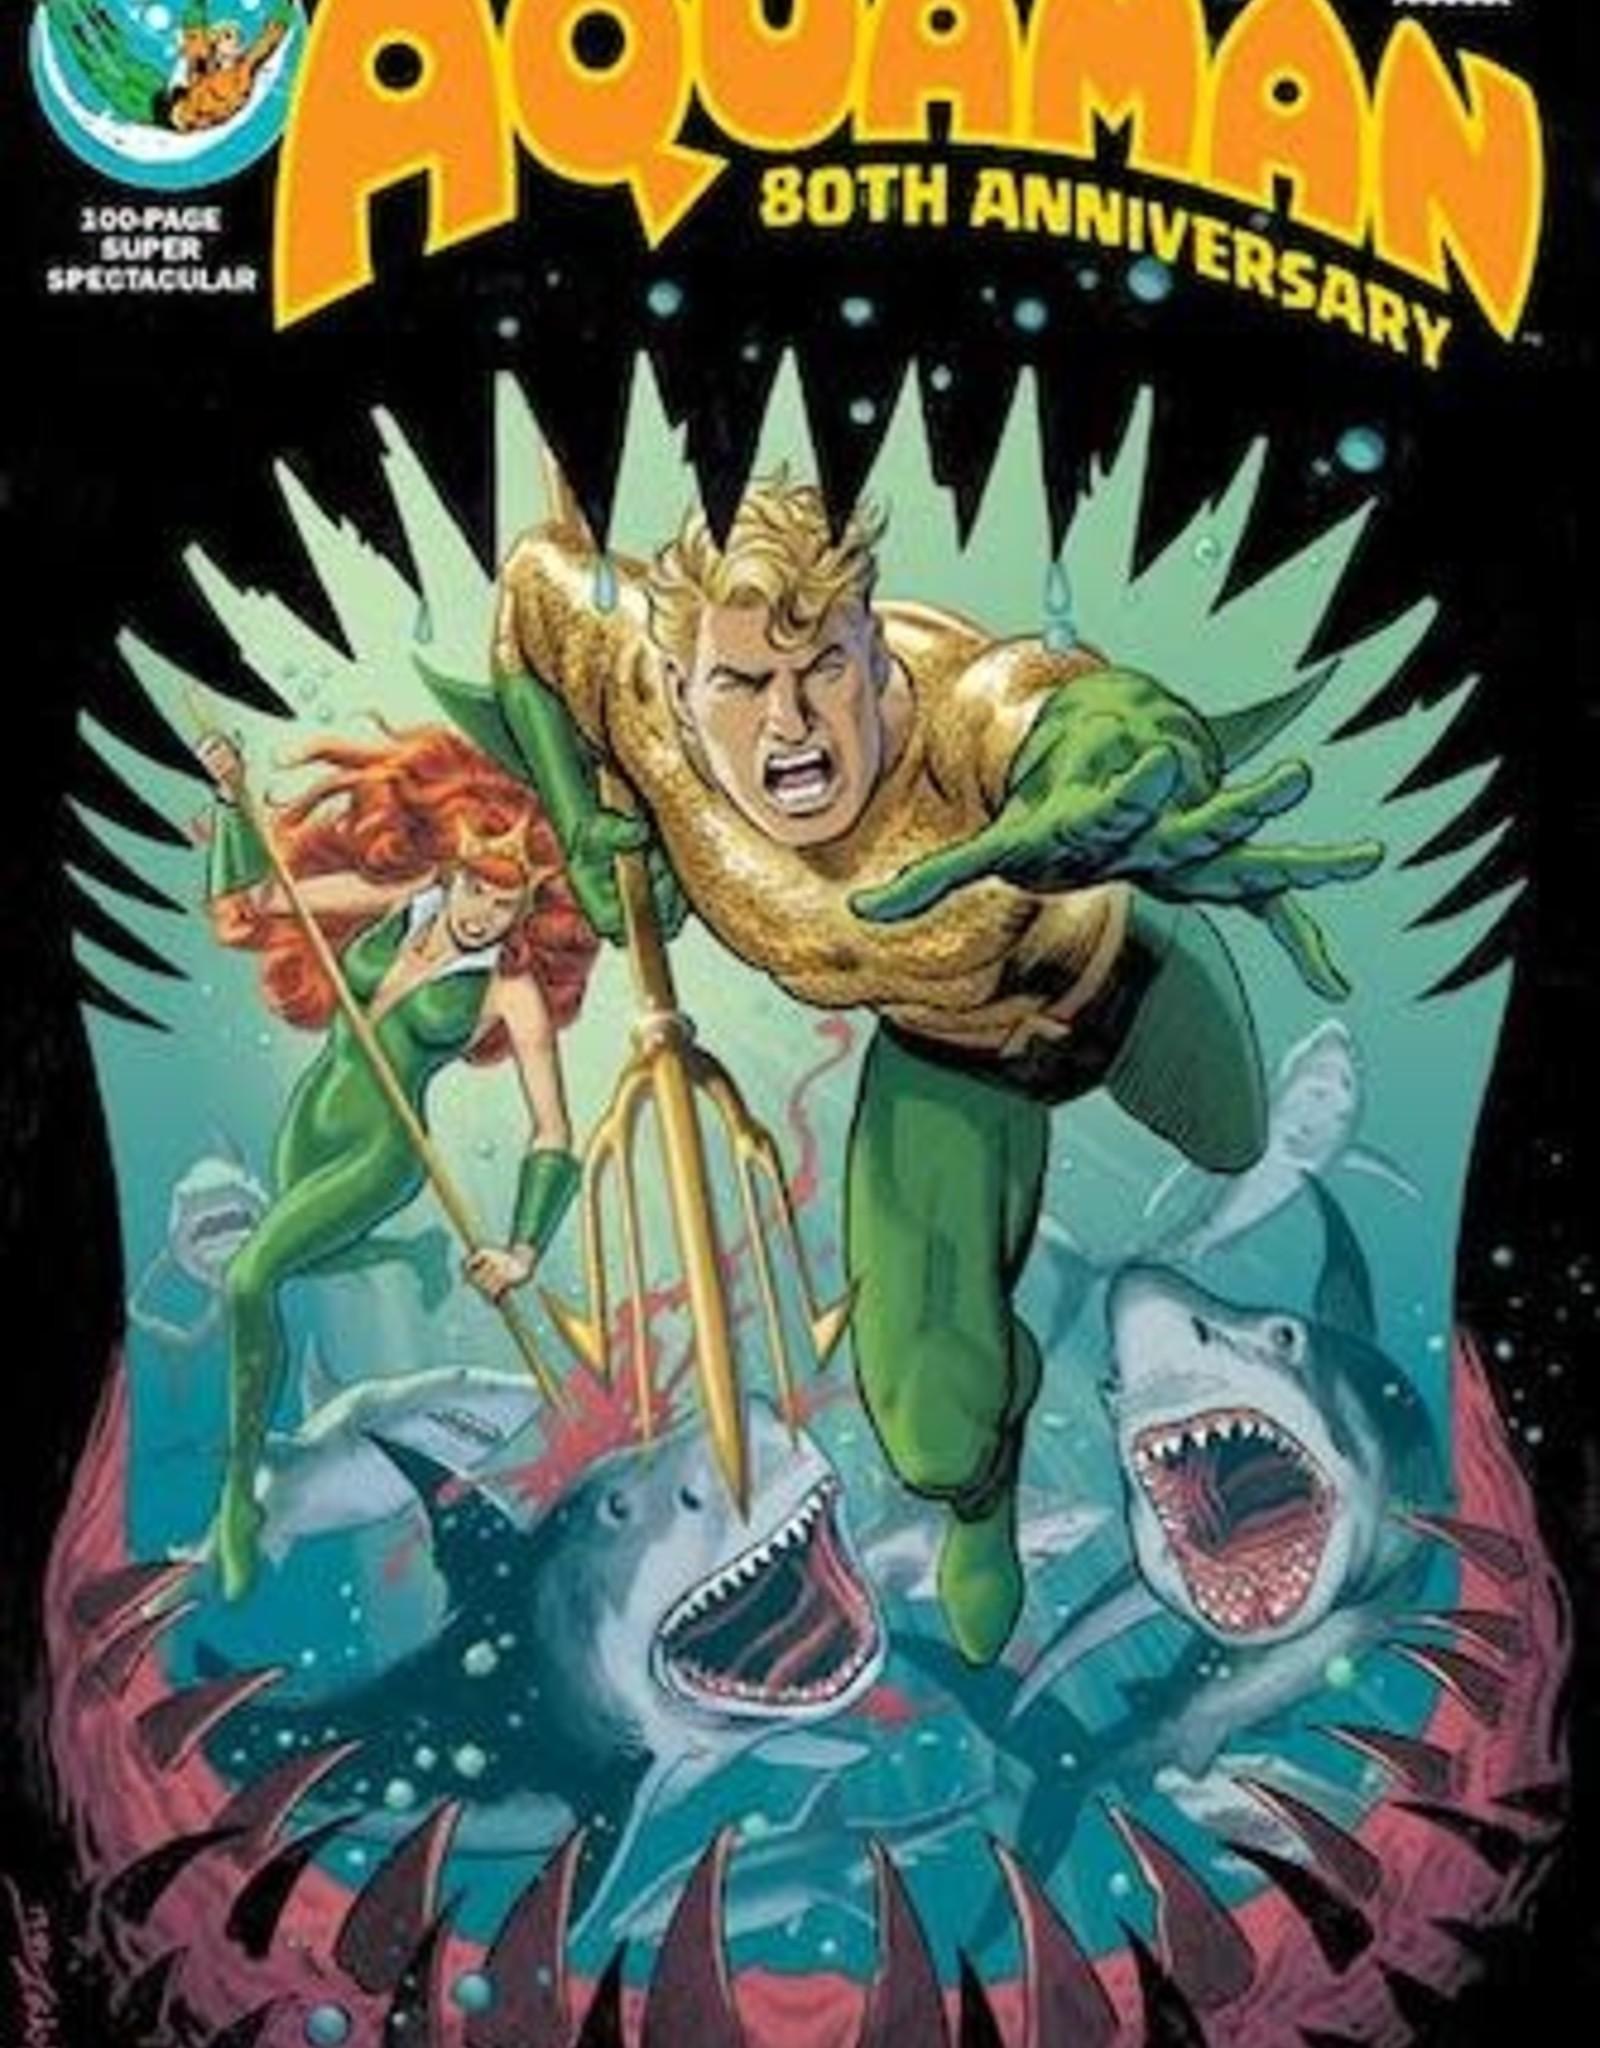 DC Comics Aquaman 80th Anniversary 100-Page Super Spectacular #1 (One Shot) Cvr E Jose Luis Garcia-lopez 1970s Var